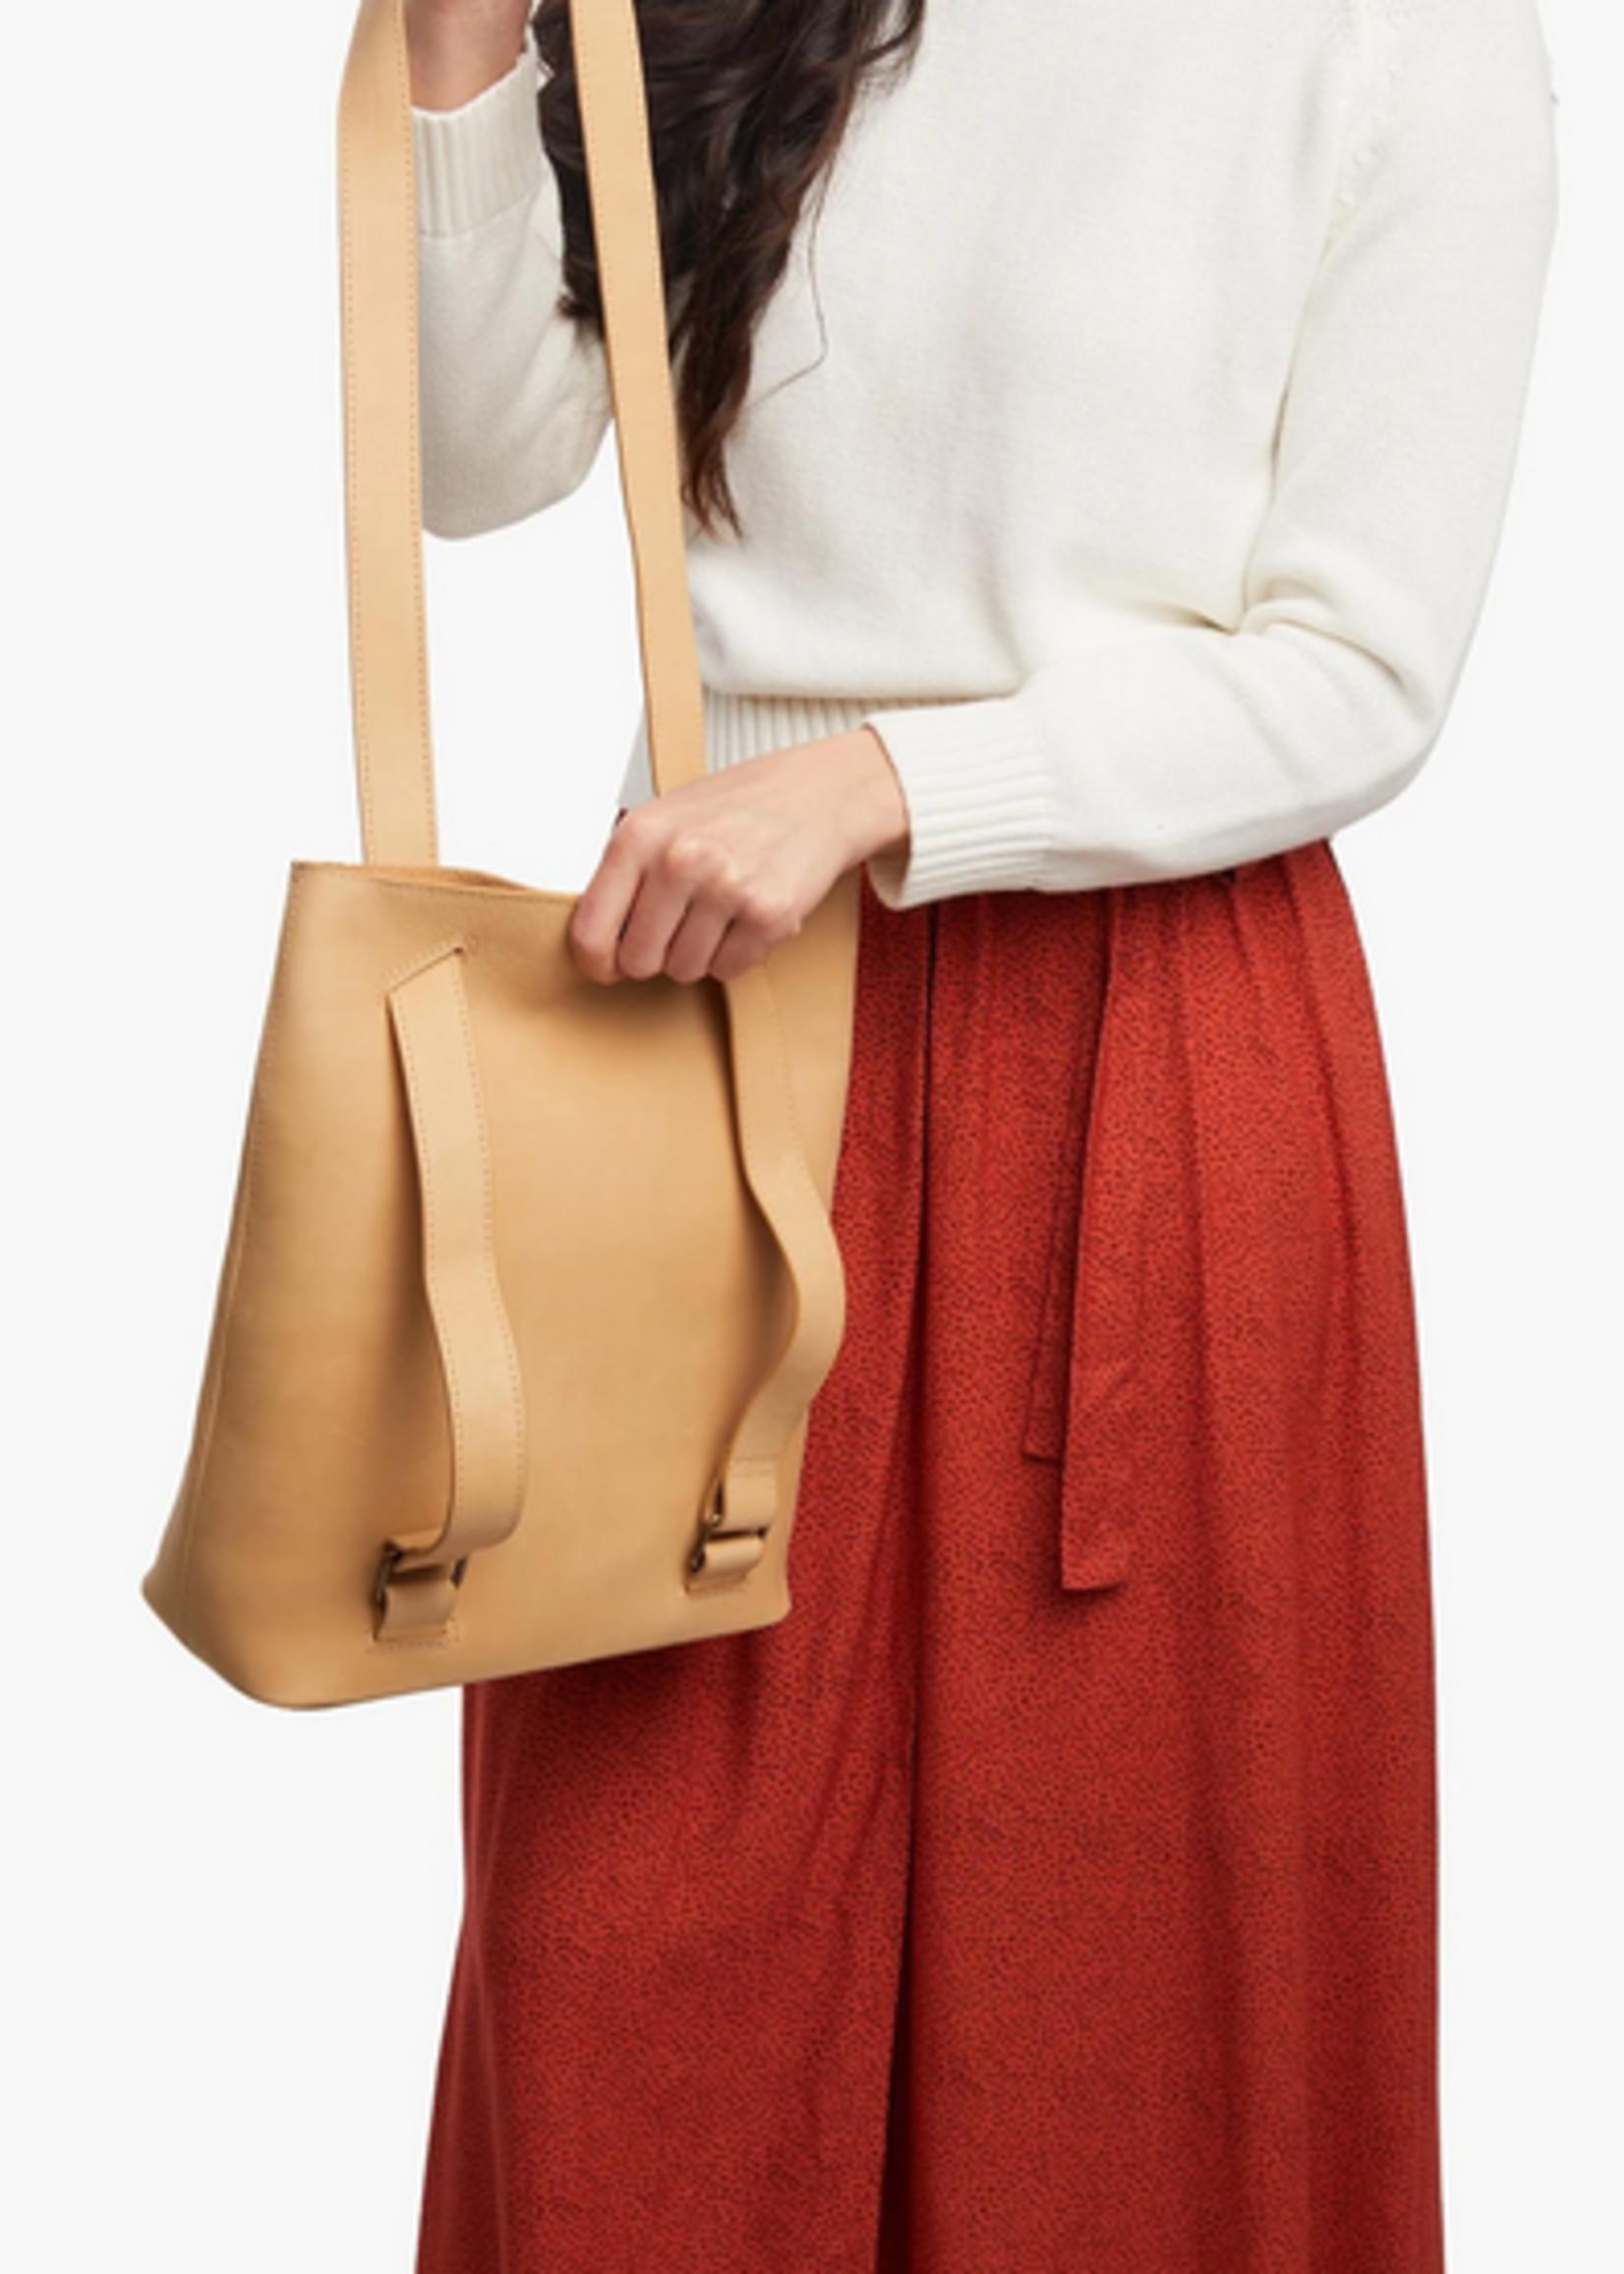 Elitaire Boutique Nelita Backpack